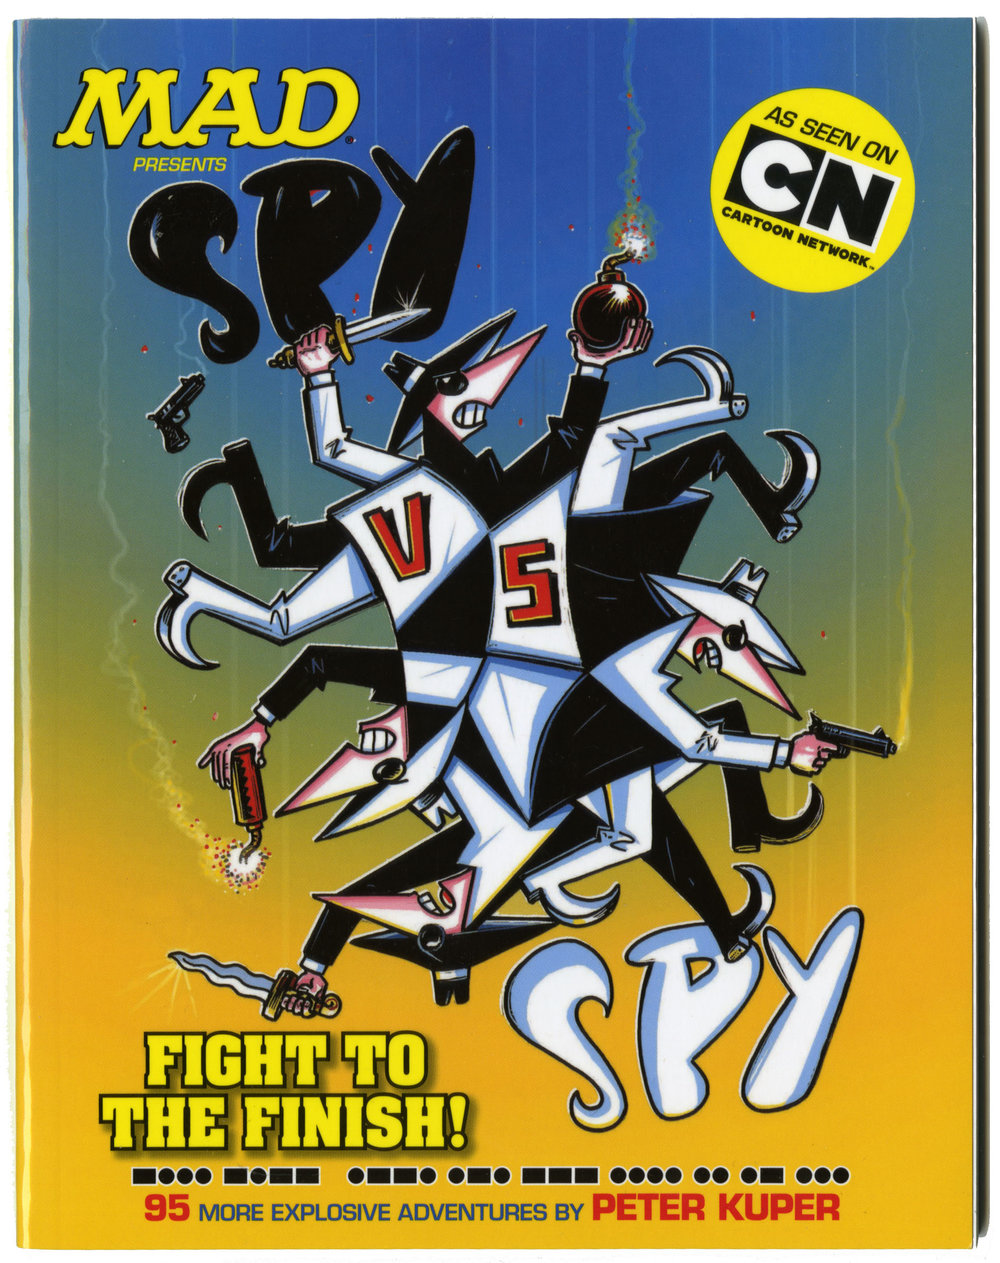 Spy Fight to finish.jpg